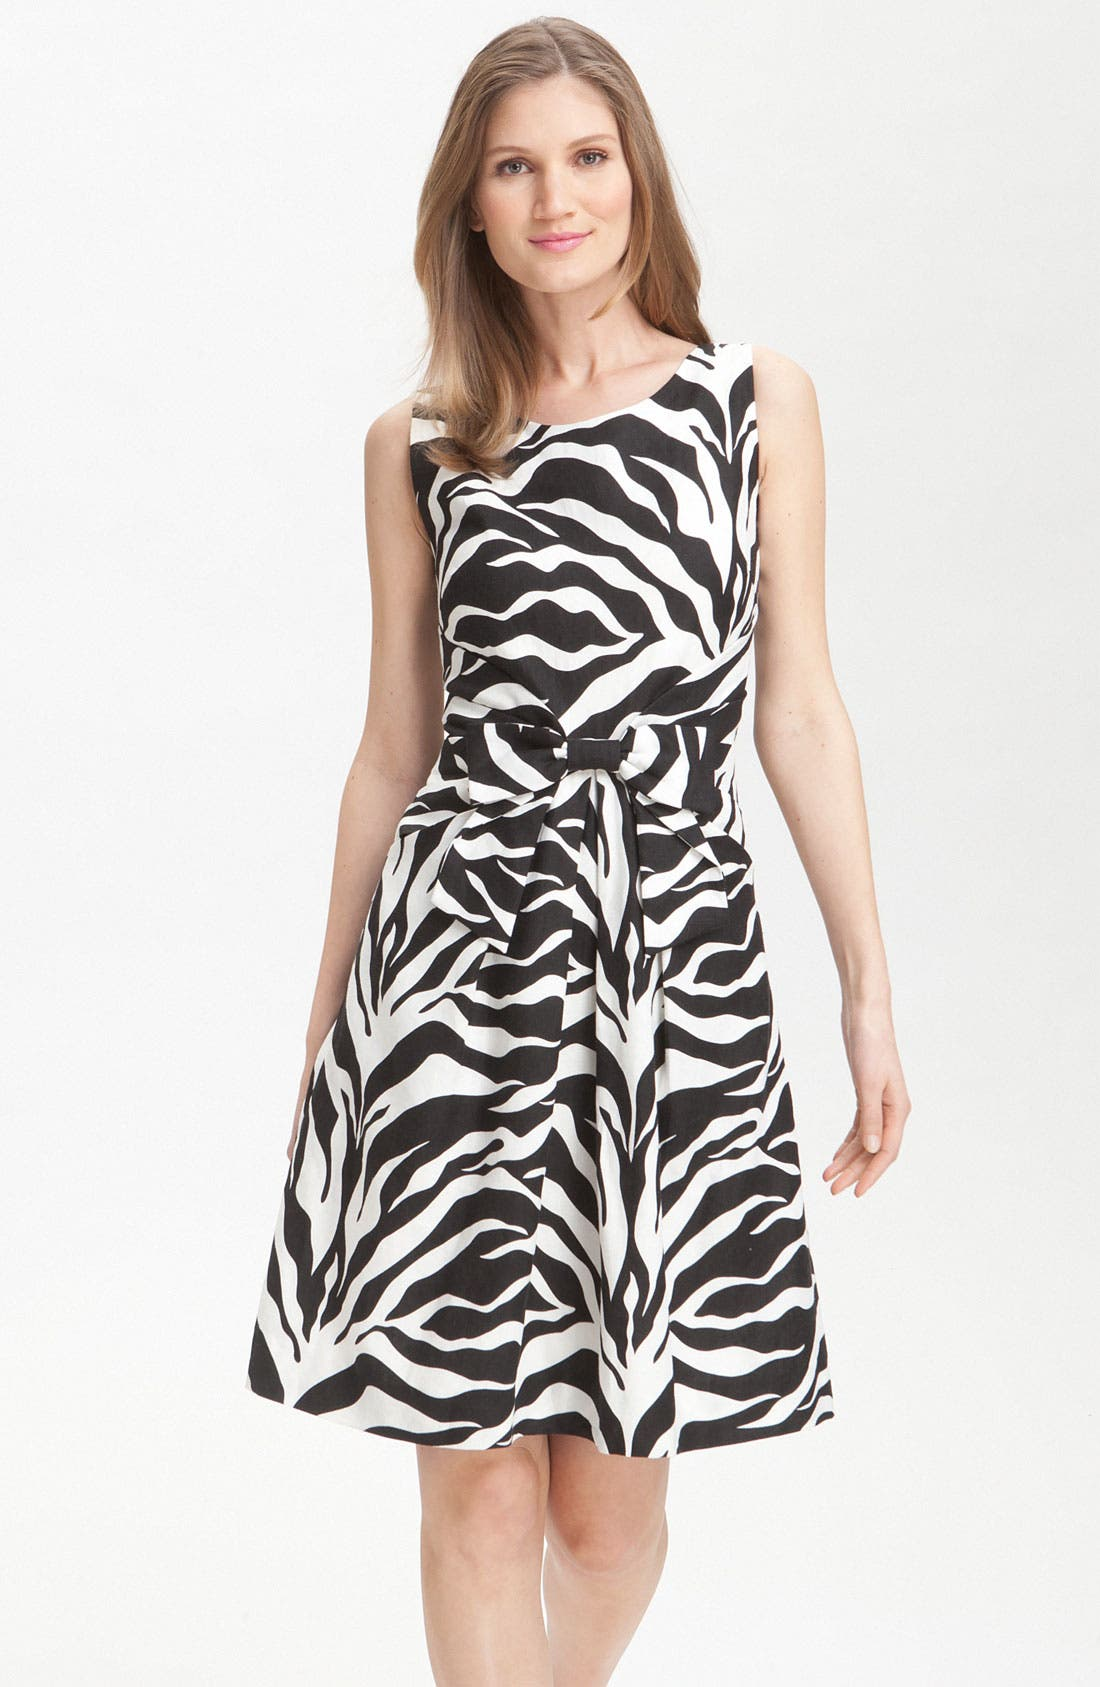 Alternate Image 1 Selected - kate spade new york 'jillian' animal print dress